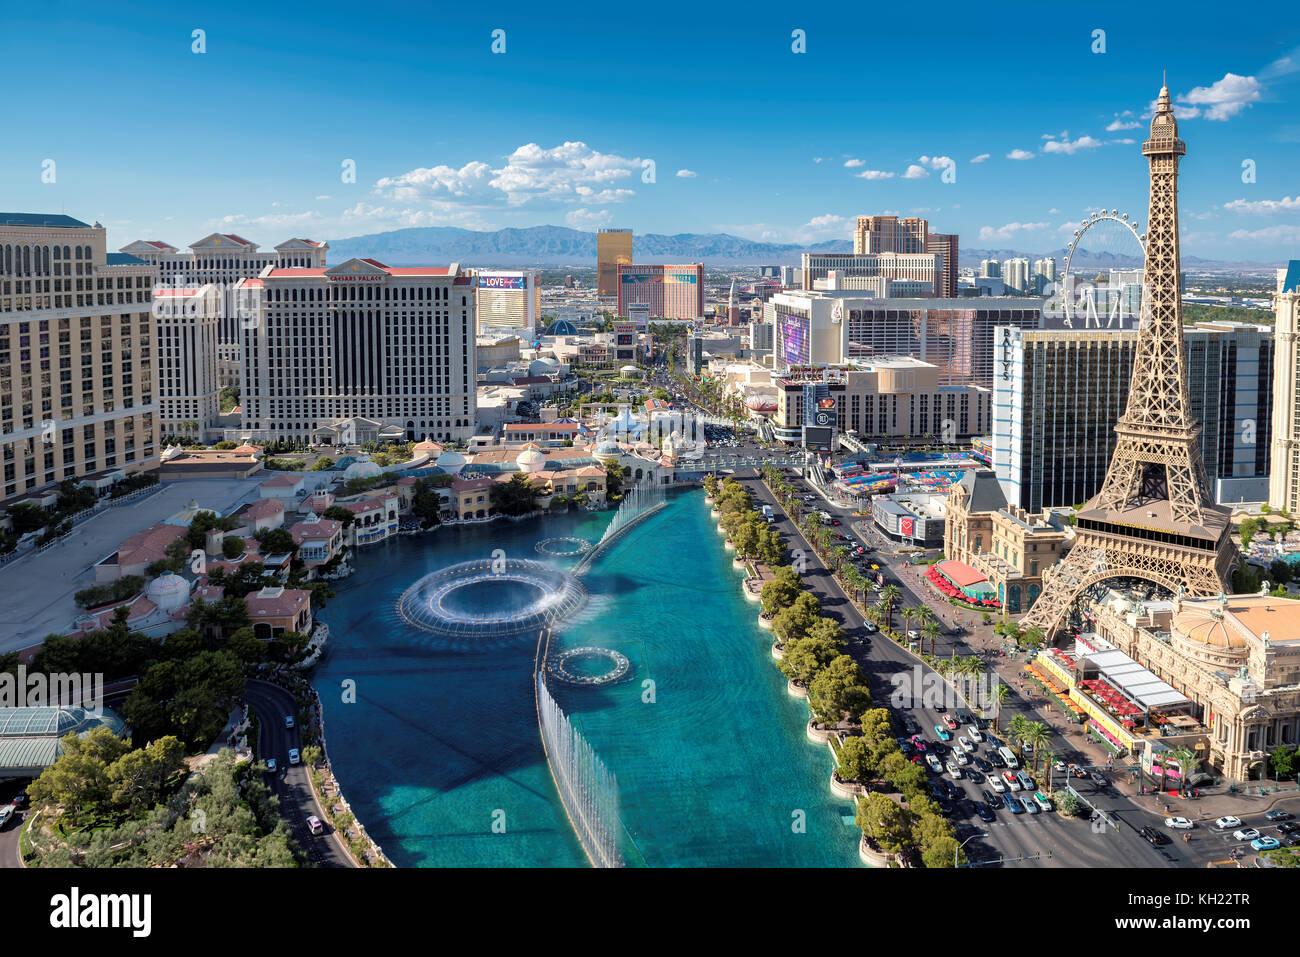 Strip de Las Vegas skyline at sunny day Photo Stock